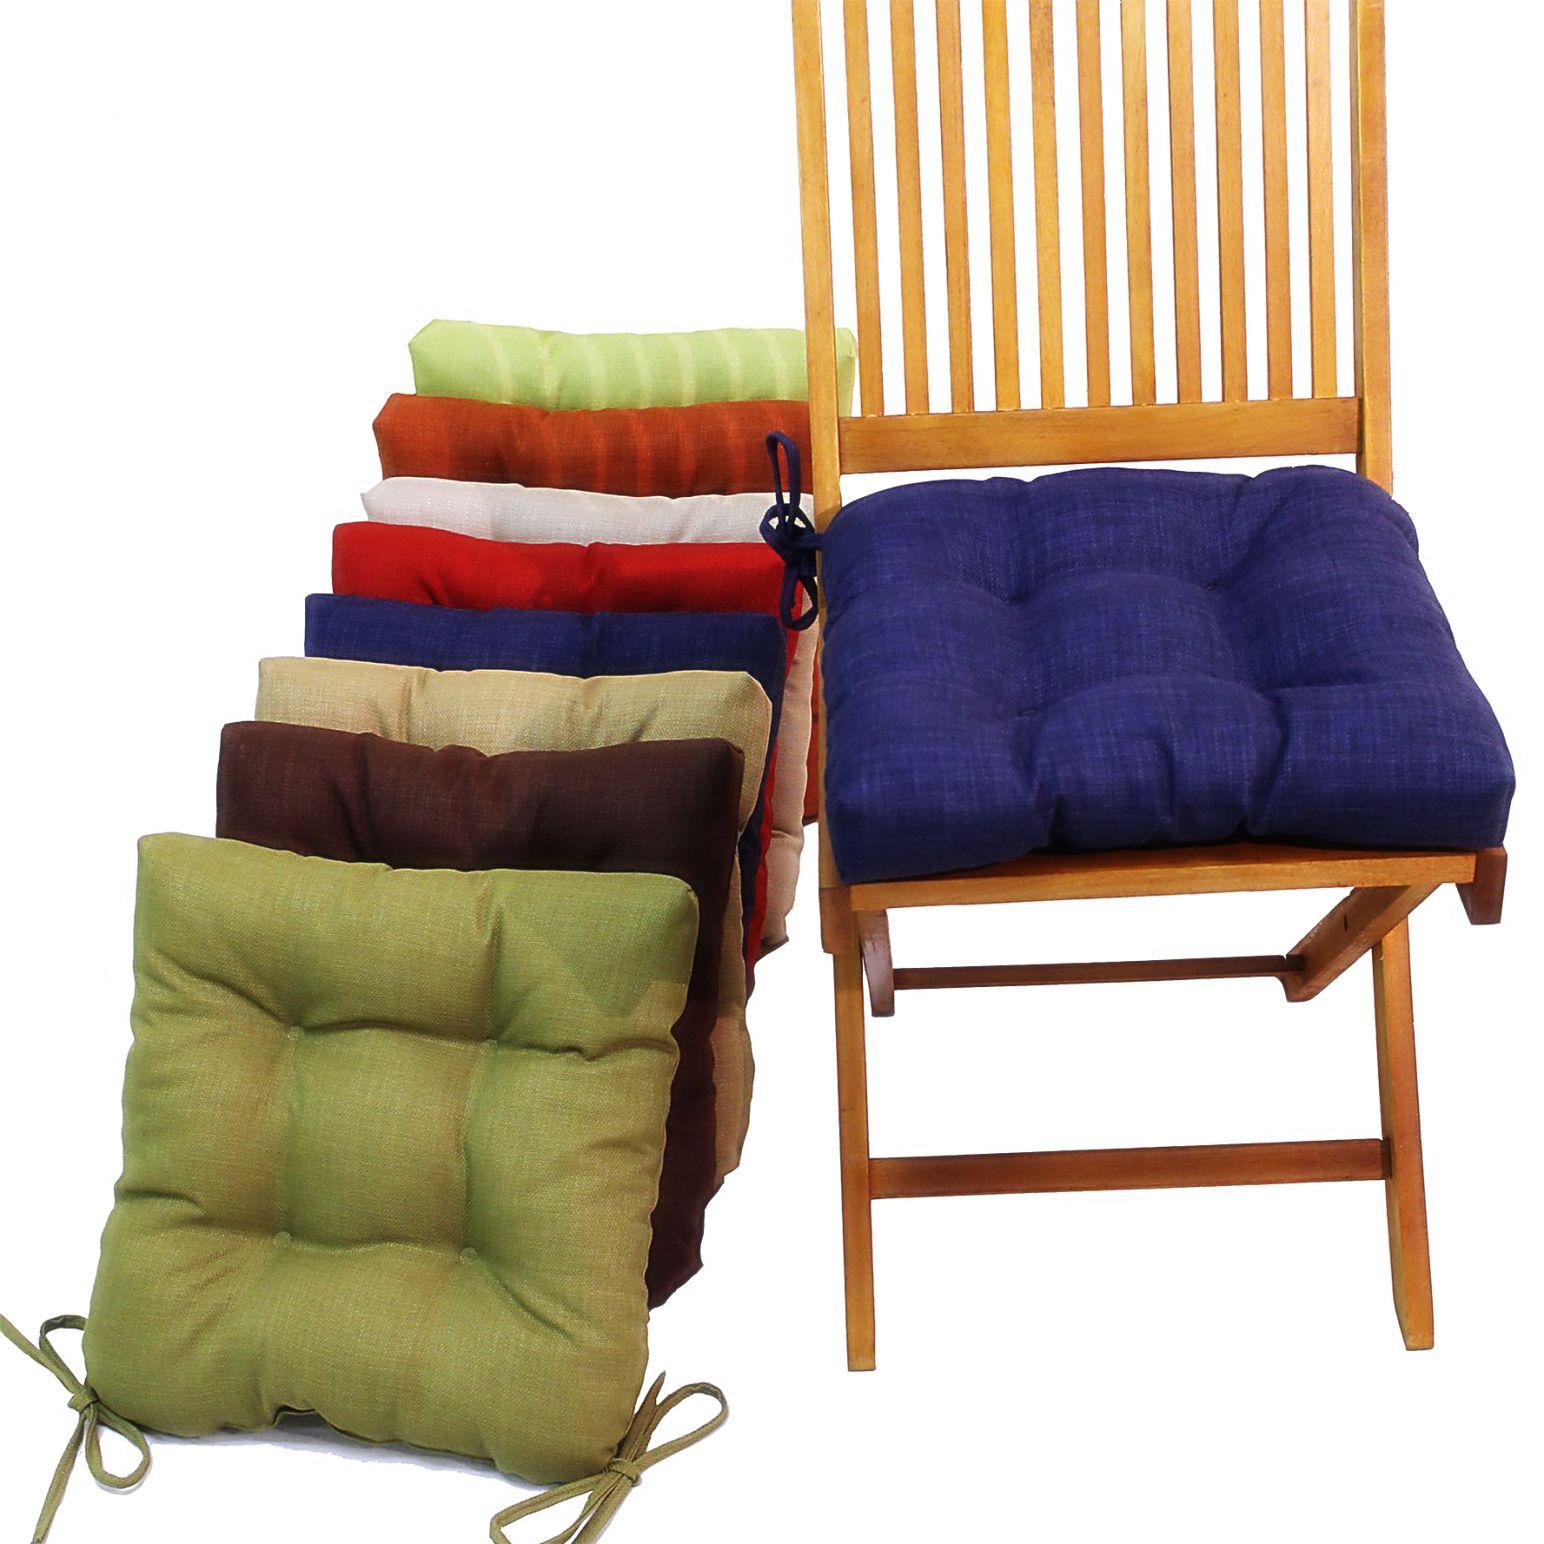 3+ Green Kitchen Chair Cushions - Kitchen Design Ideas Images